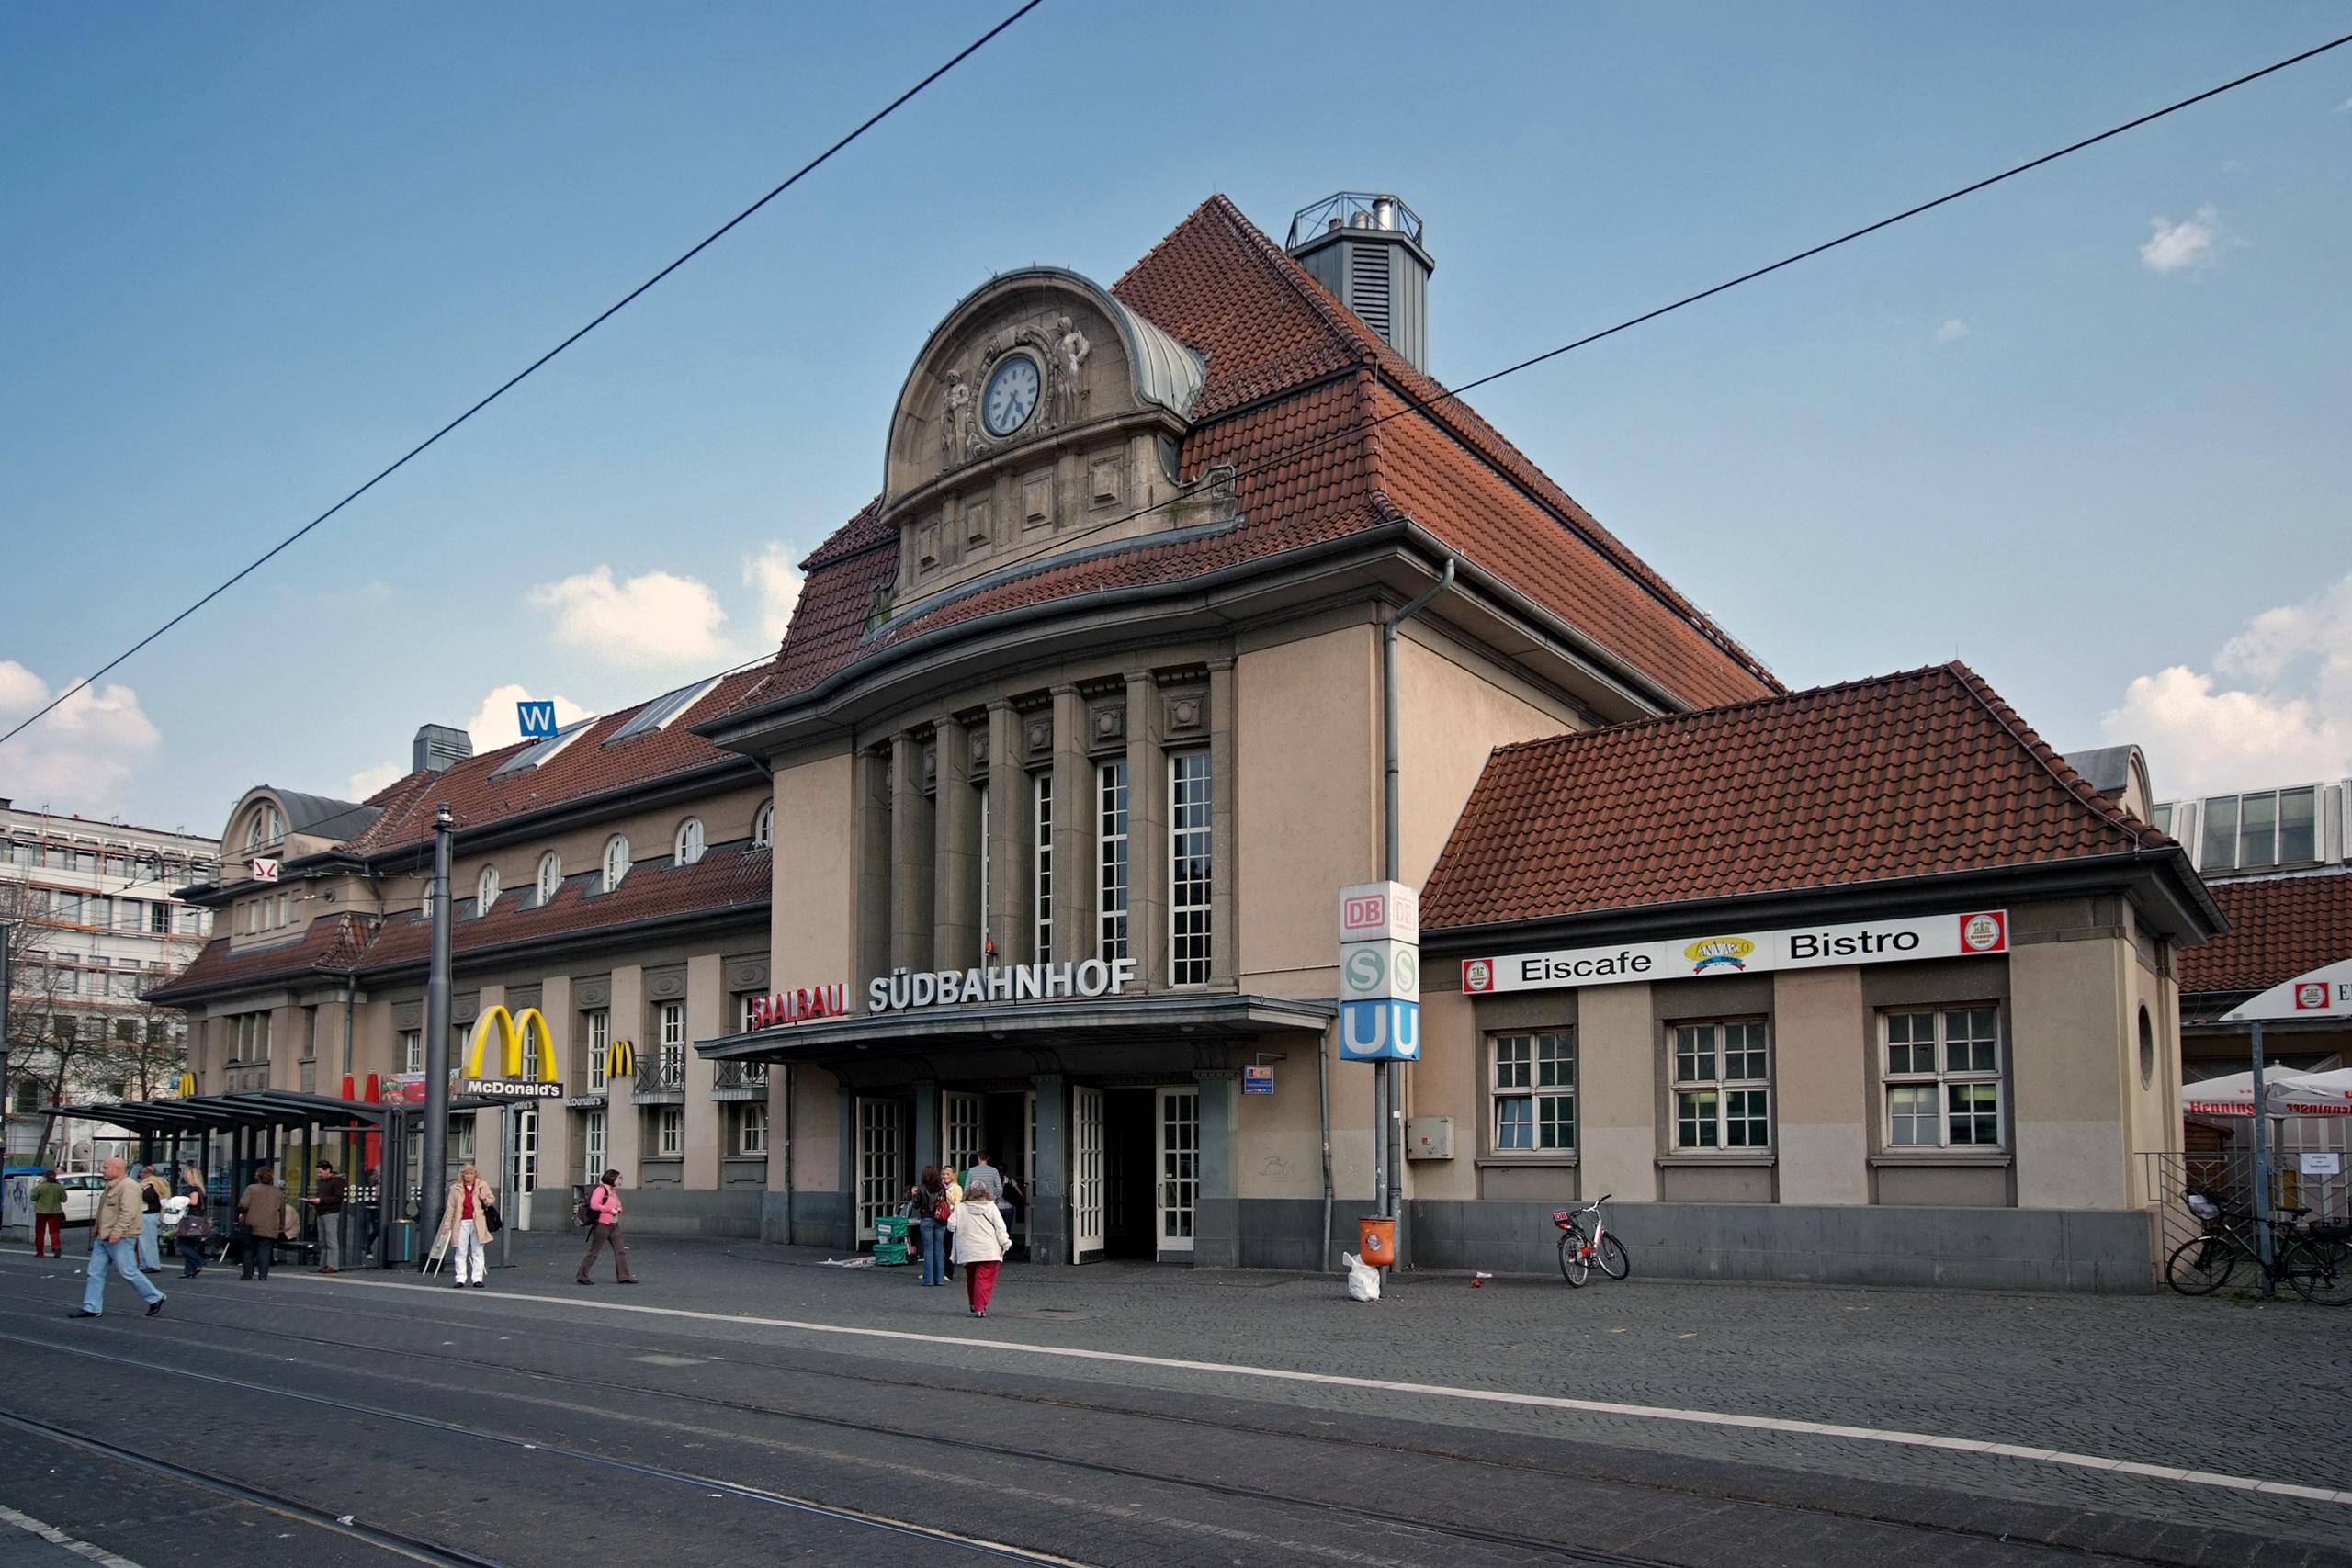 File:Suedbahnhof Ffm Bahnhofsgebaeude.jpg